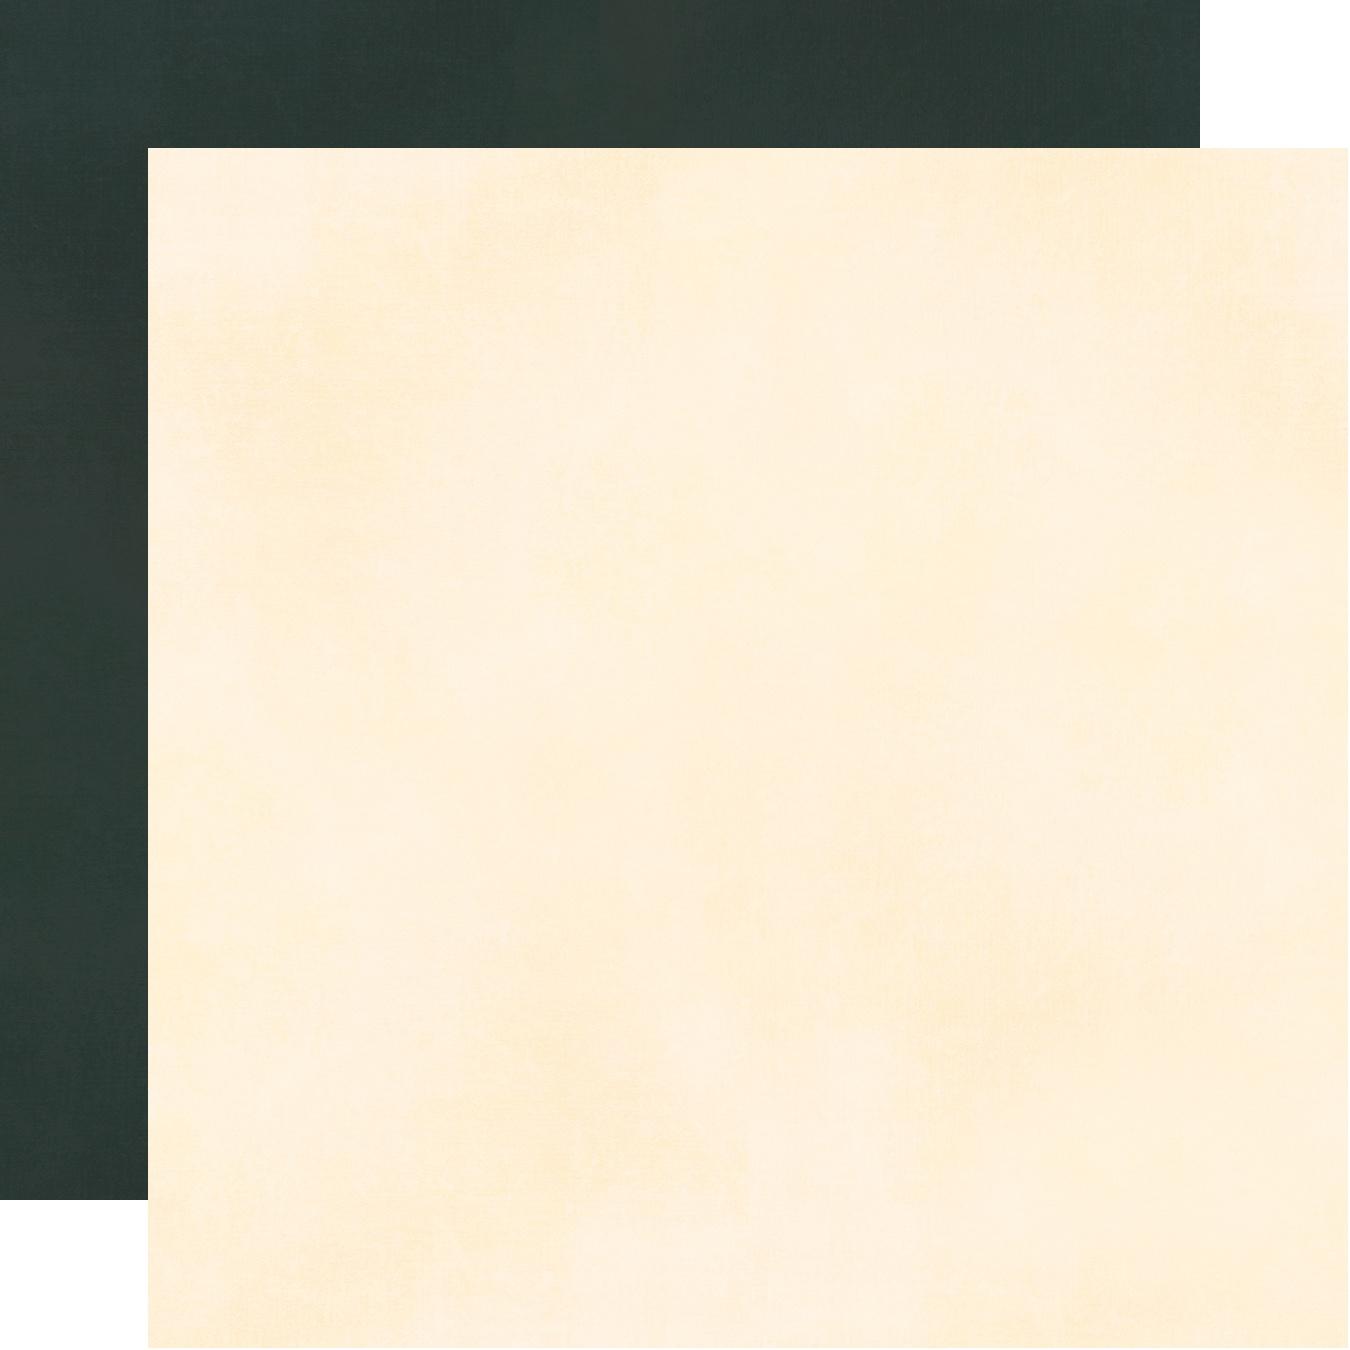 Spring Farmhouse Double-Sided Cardstock 12X12-Black/Cream Simple Basic